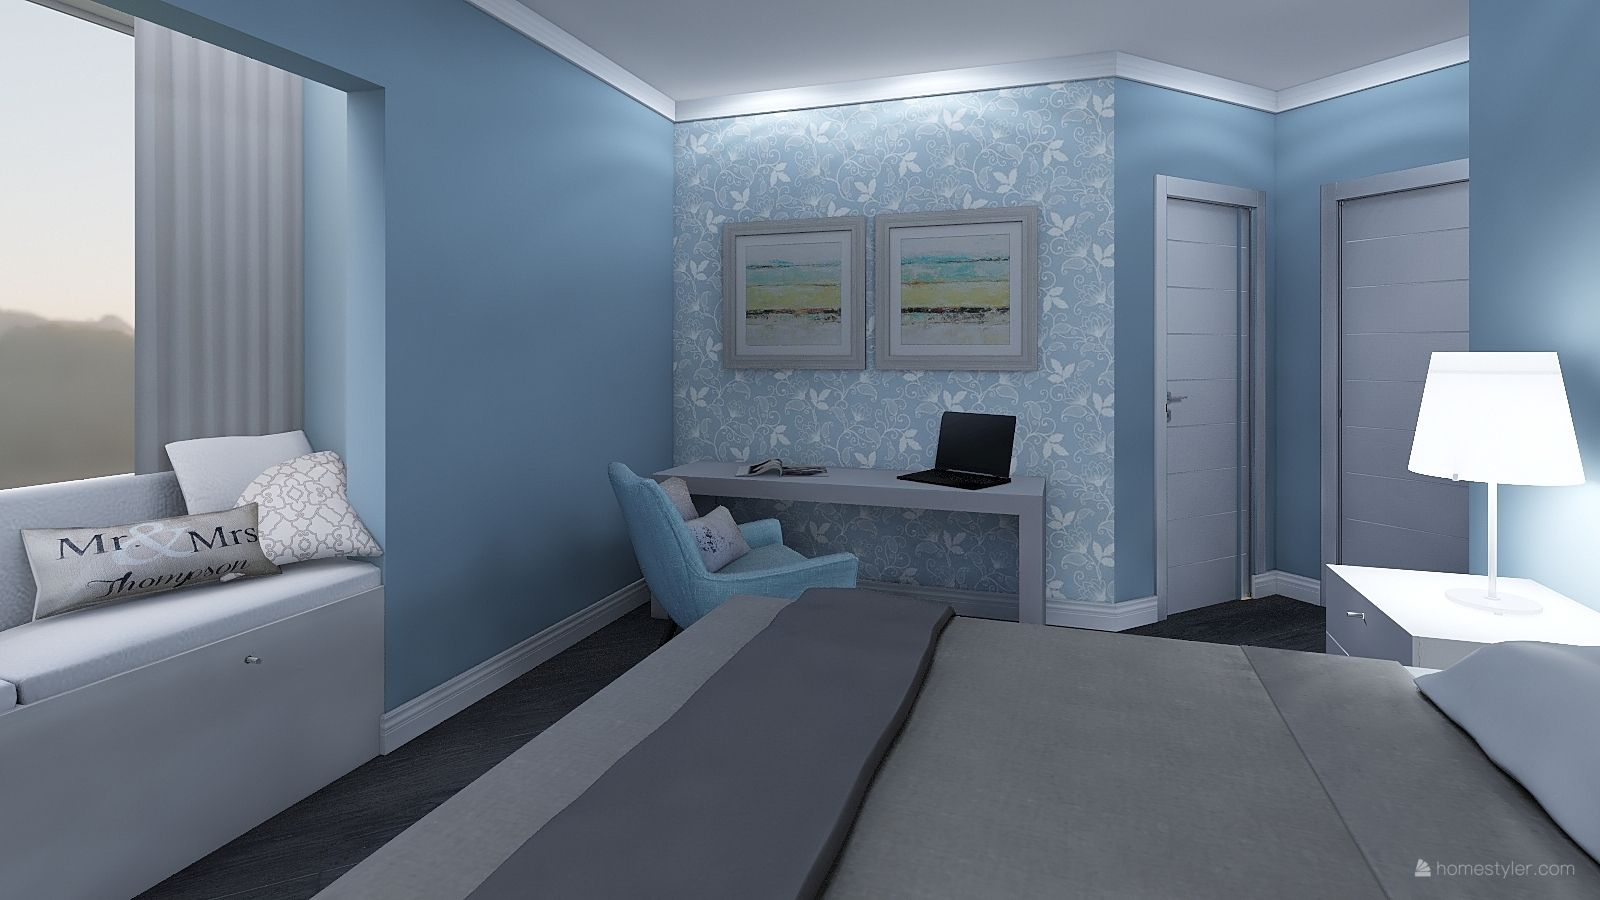 Bedroom Design By Chris M Interiordesign Bedroomdecor 3d Home